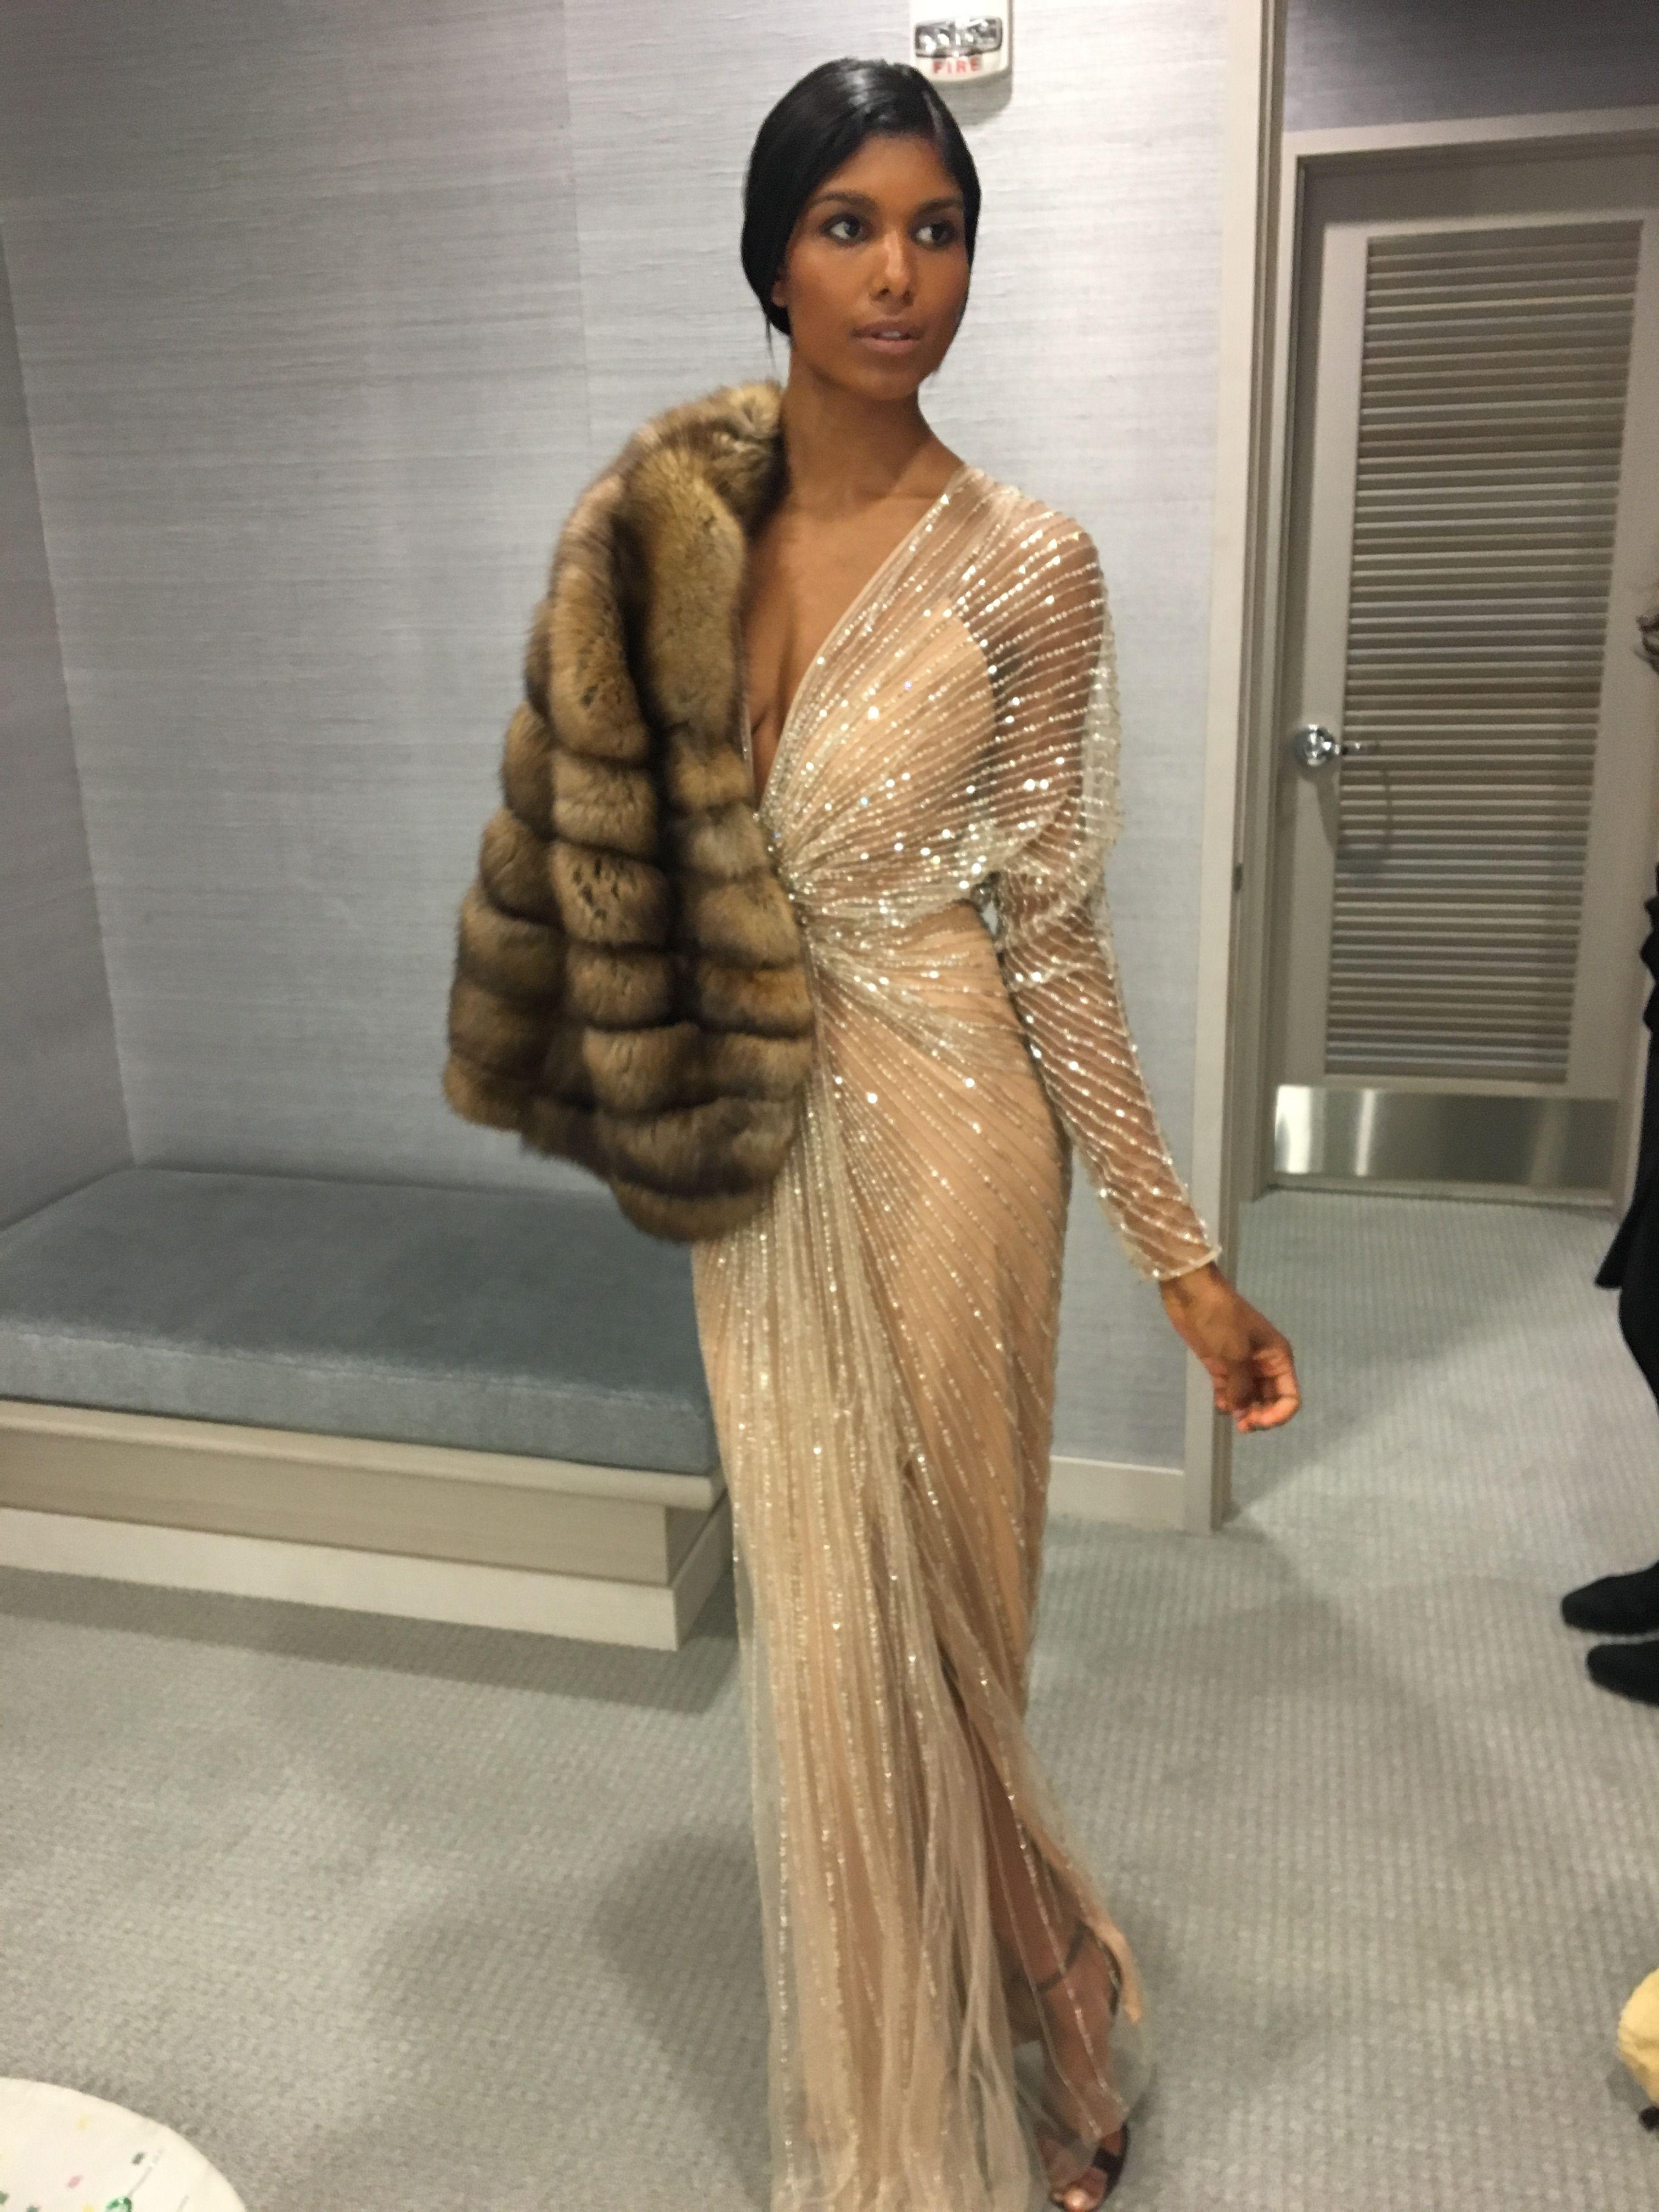 Gorski Golden Sable, glowing designer gown - seen at Neiman Marcus ...